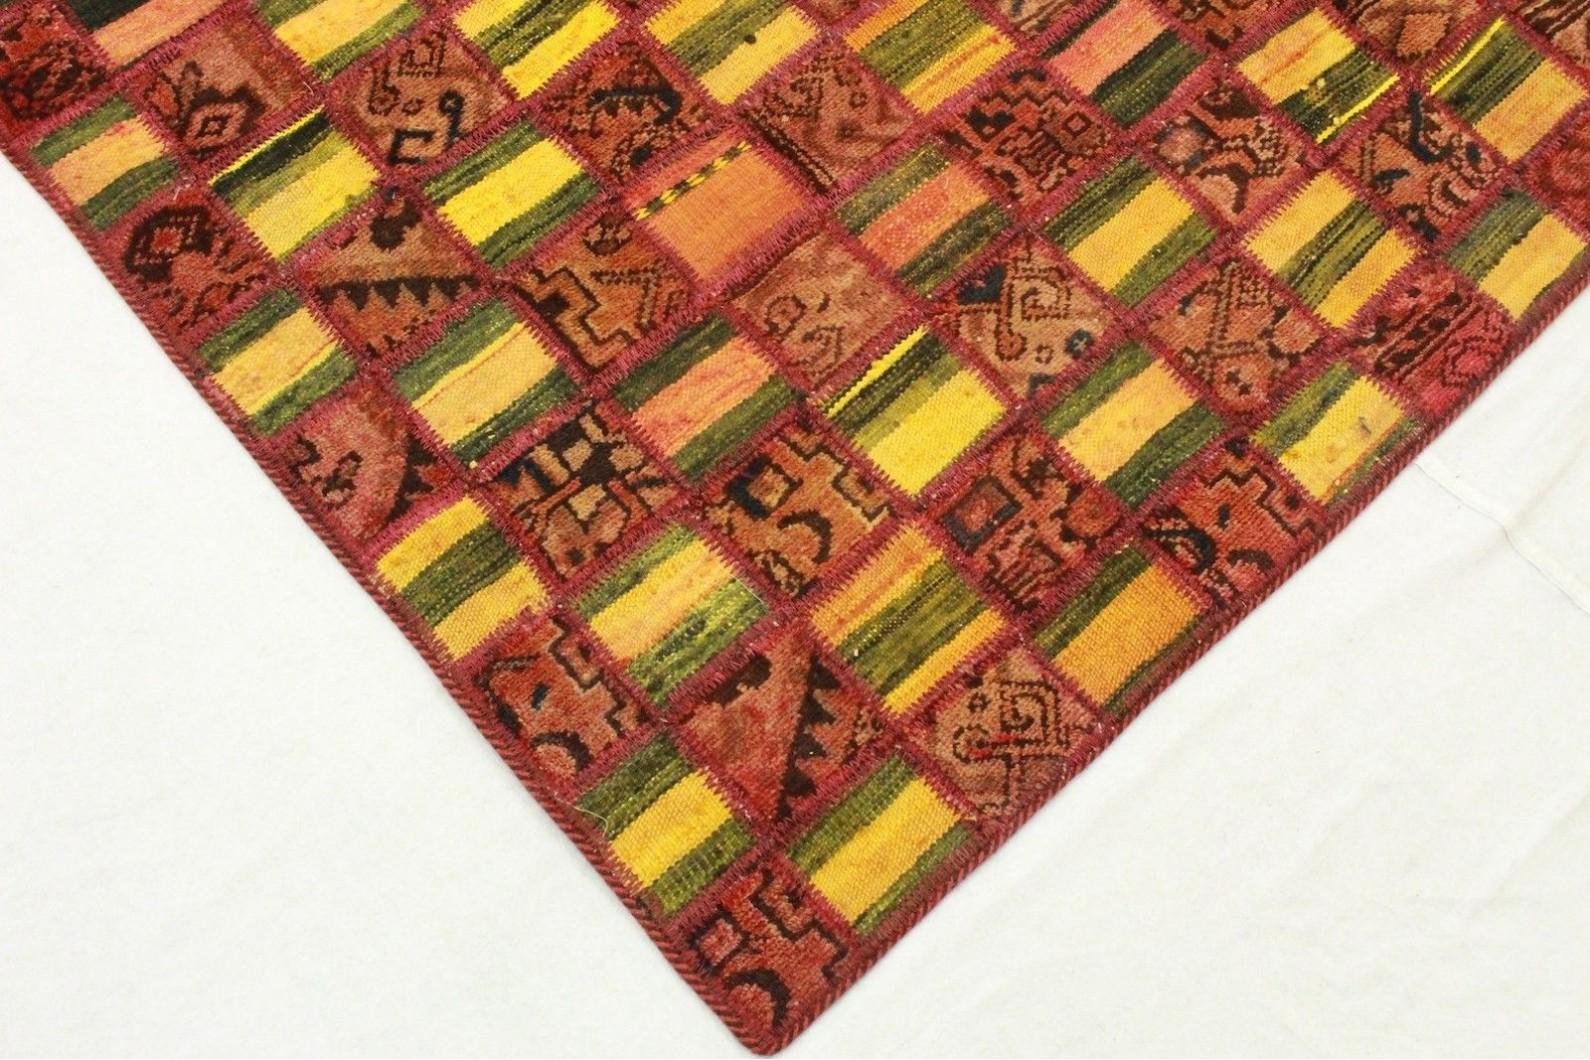 kelim patchwork teppich gr n rot in 210x160cm 1001 2333 bei kaufen. Black Bedroom Furniture Sets. Home Design Ideas